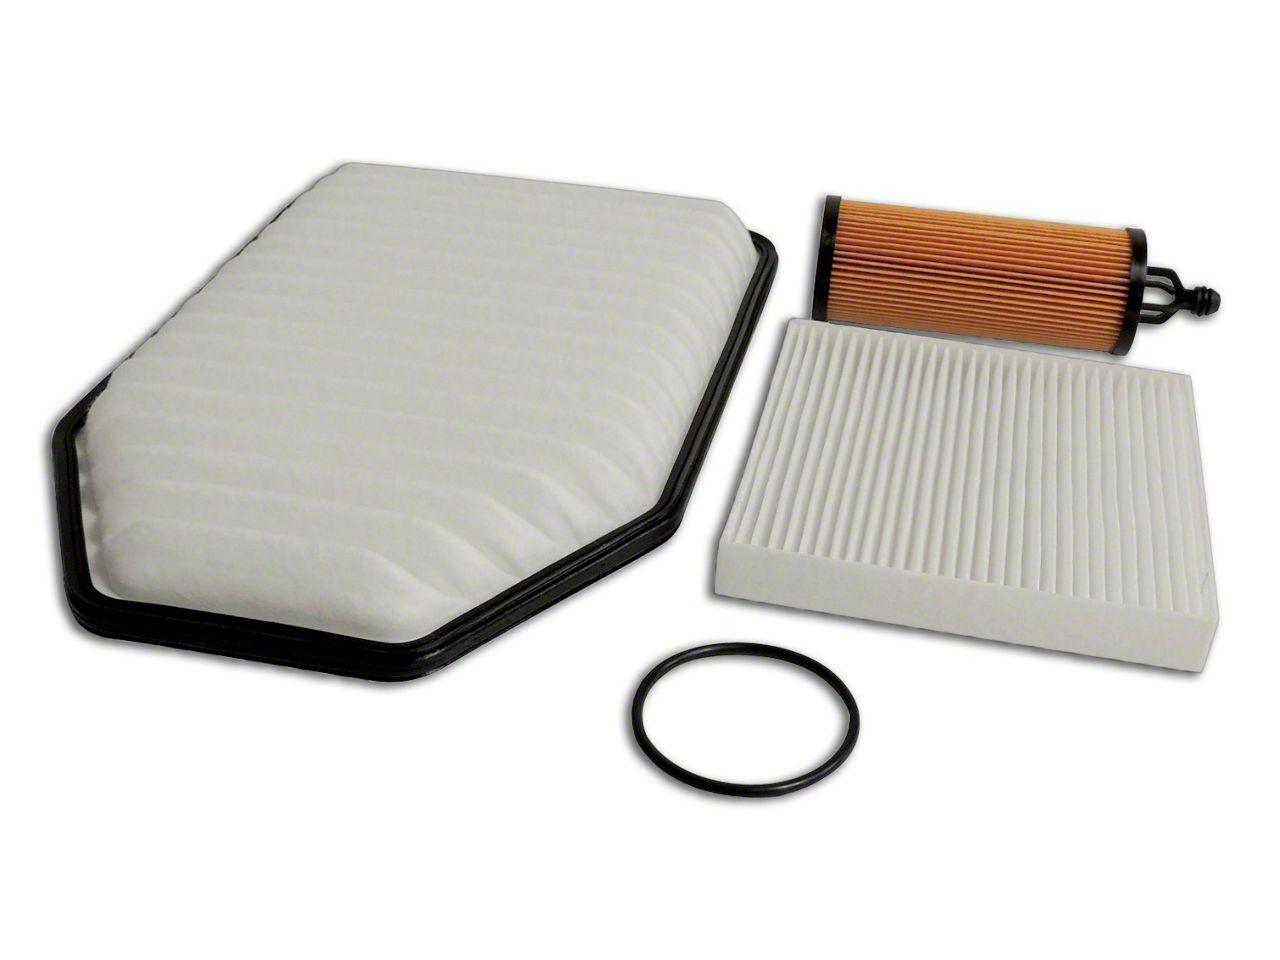 Master Filter Kit (14-18 3.6L Jeep Wrangler JK)